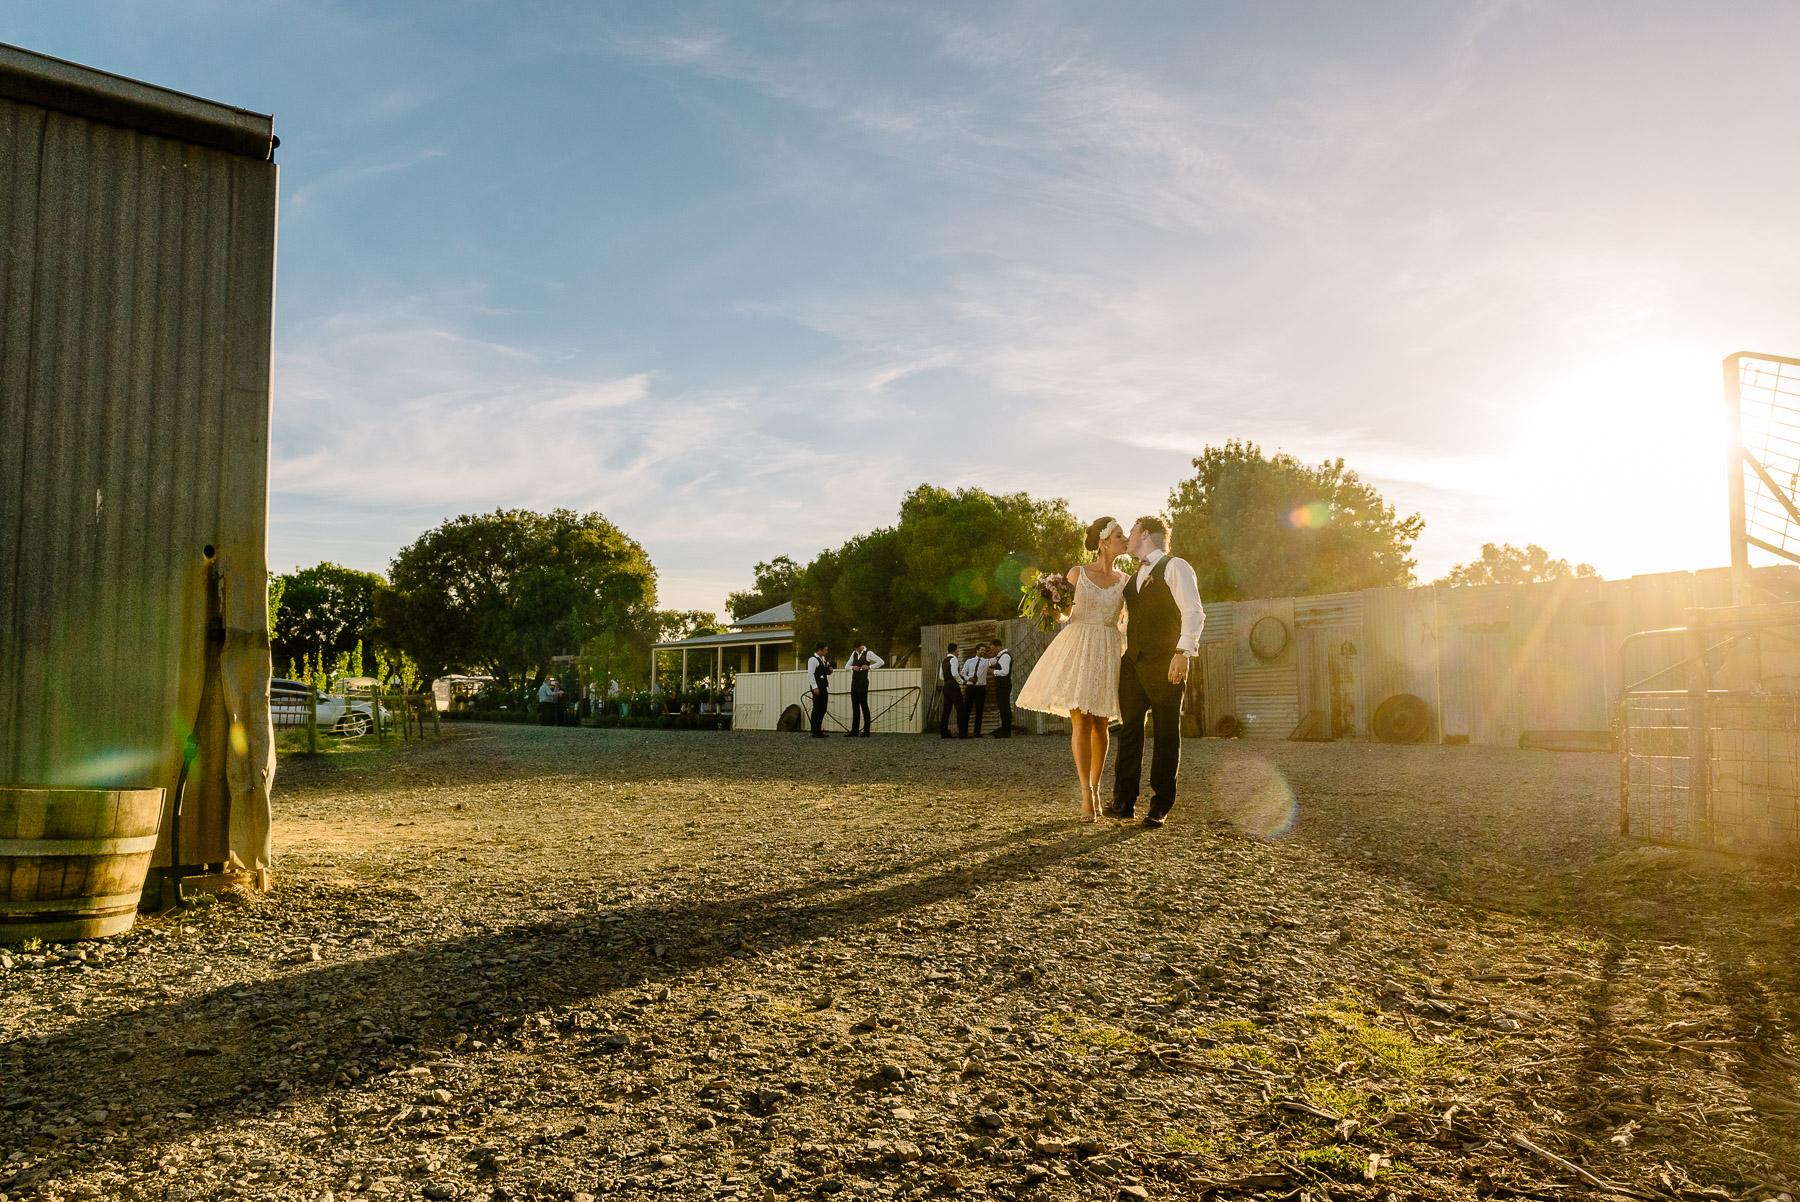 Melissa_and_Kristan_Echuca_Farm_Wedding_New_Years_Eve-94.jpg